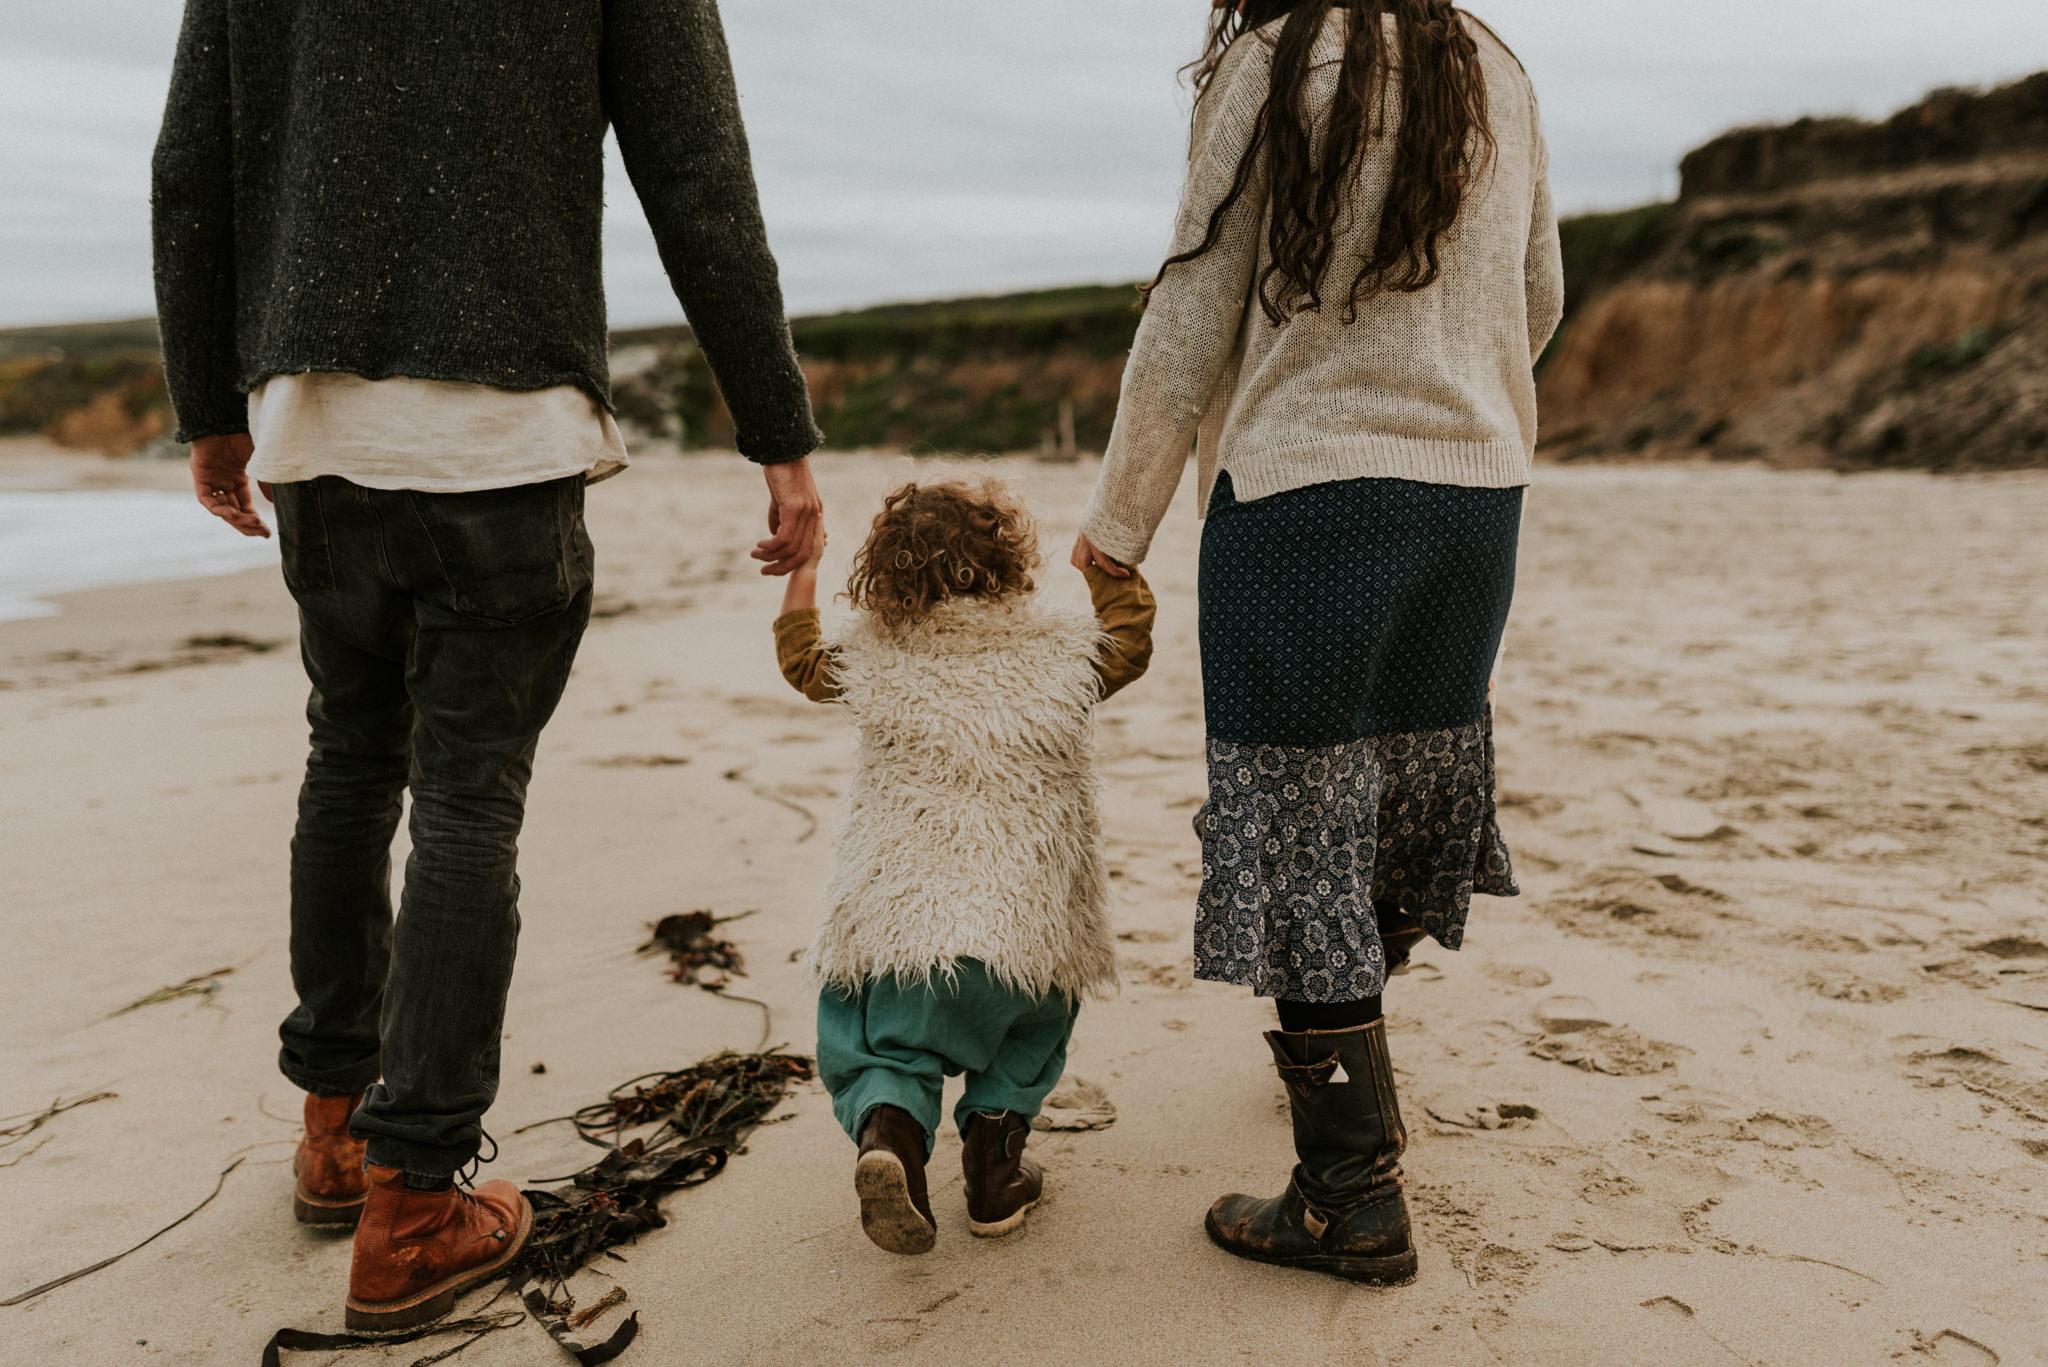 storytelling-intimate-emotive-cloudy-seaside-boho-family-session-pescadero-state-beach-san-francisco-family-photographer-kerlyn-van-gelder-photography